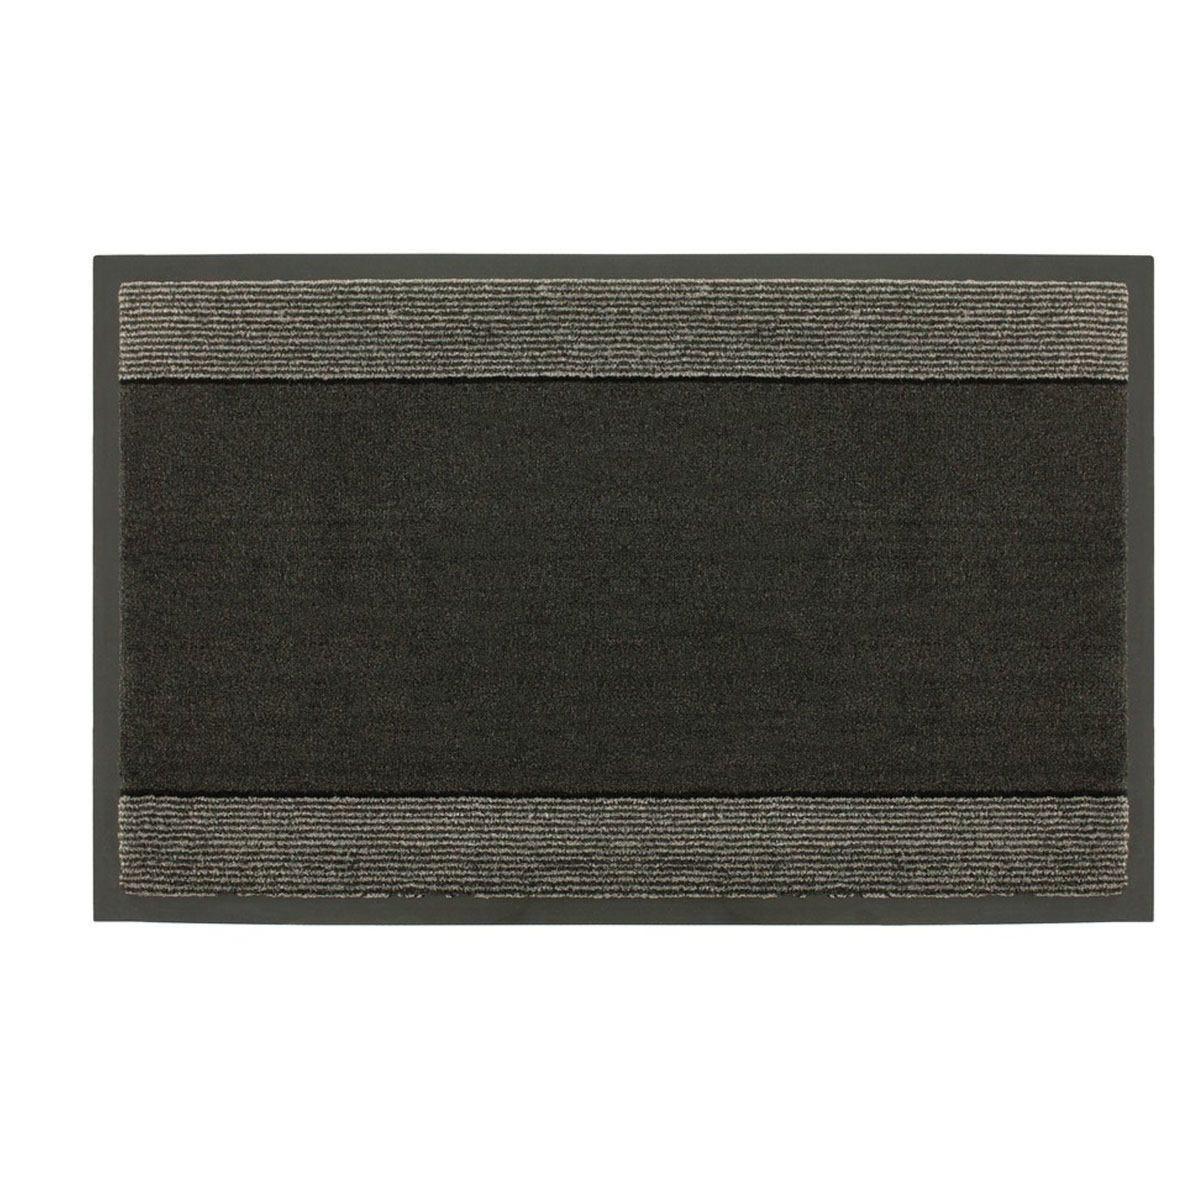 JVL Miracle Barrier 40 x 60cm Striped Door Mat - Black/Grey